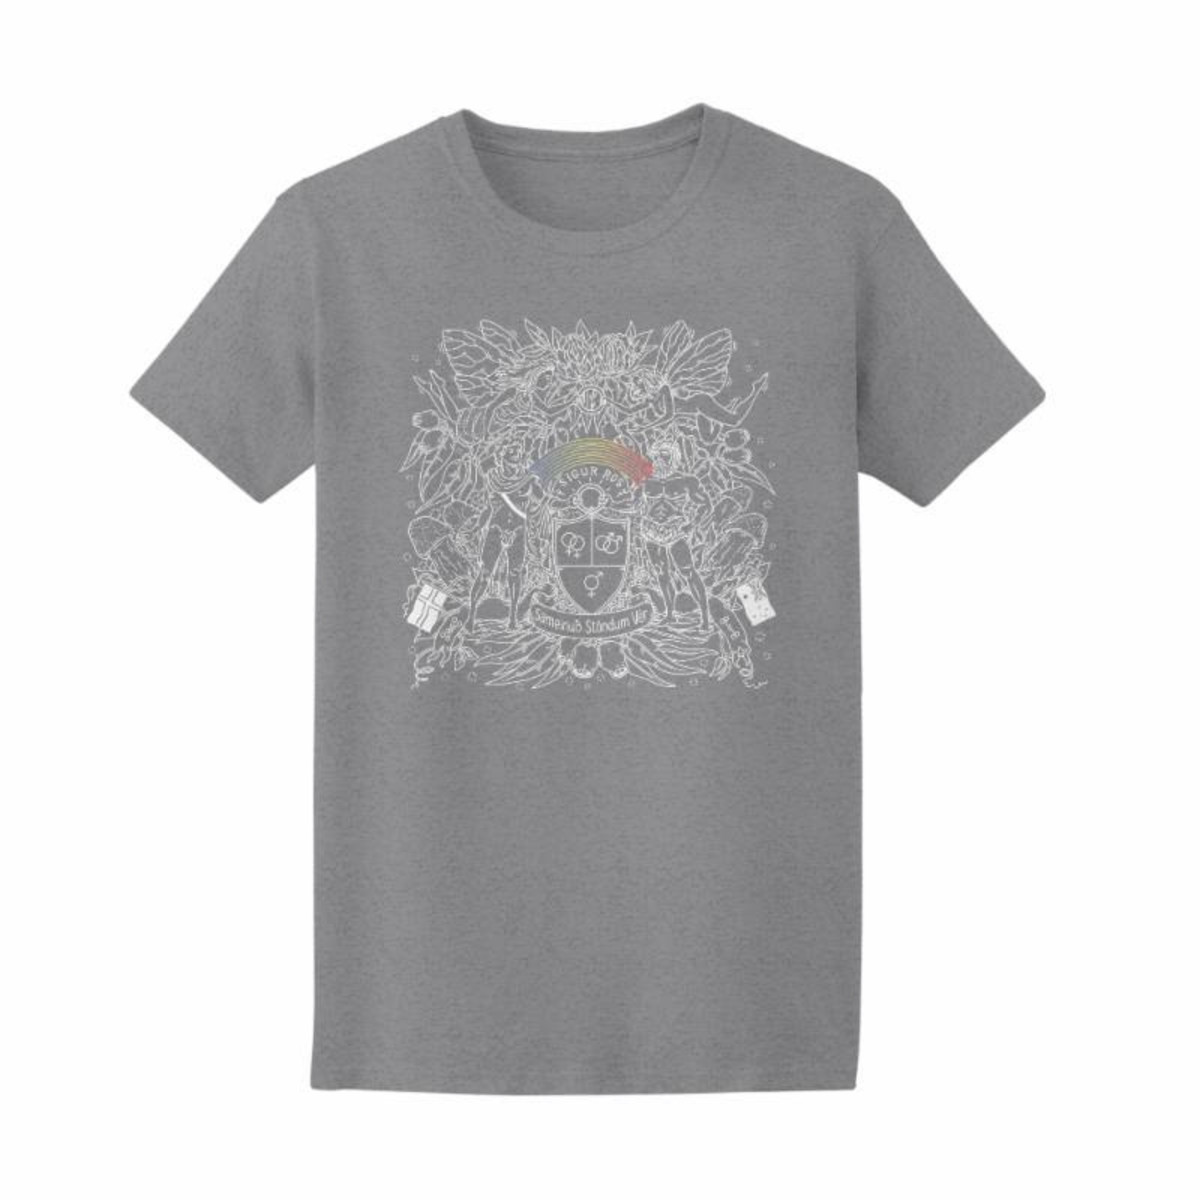 Sigur Ros Equality Shirt